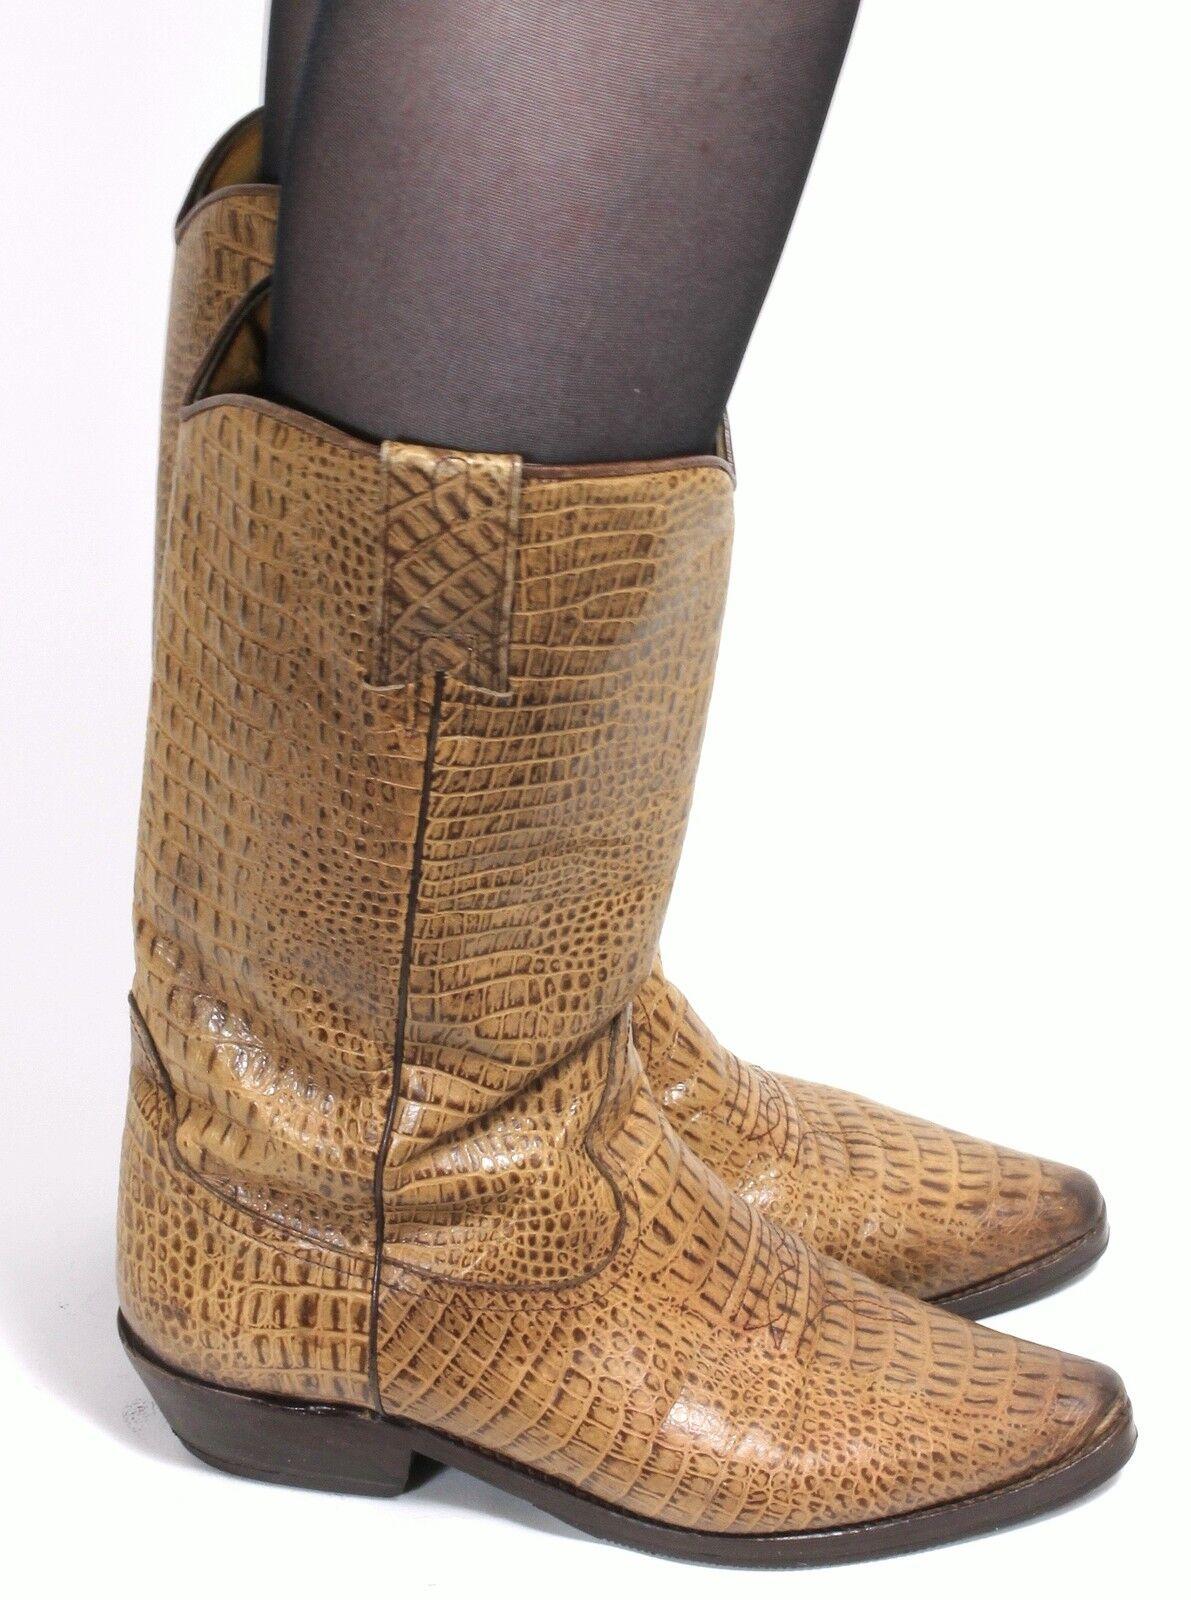 Stiefel Damenstiefel Lederstiefel Vintage Western Stiefel Lederstiefel Damenstiefel Westernstiefel Reptil 38 07cef8